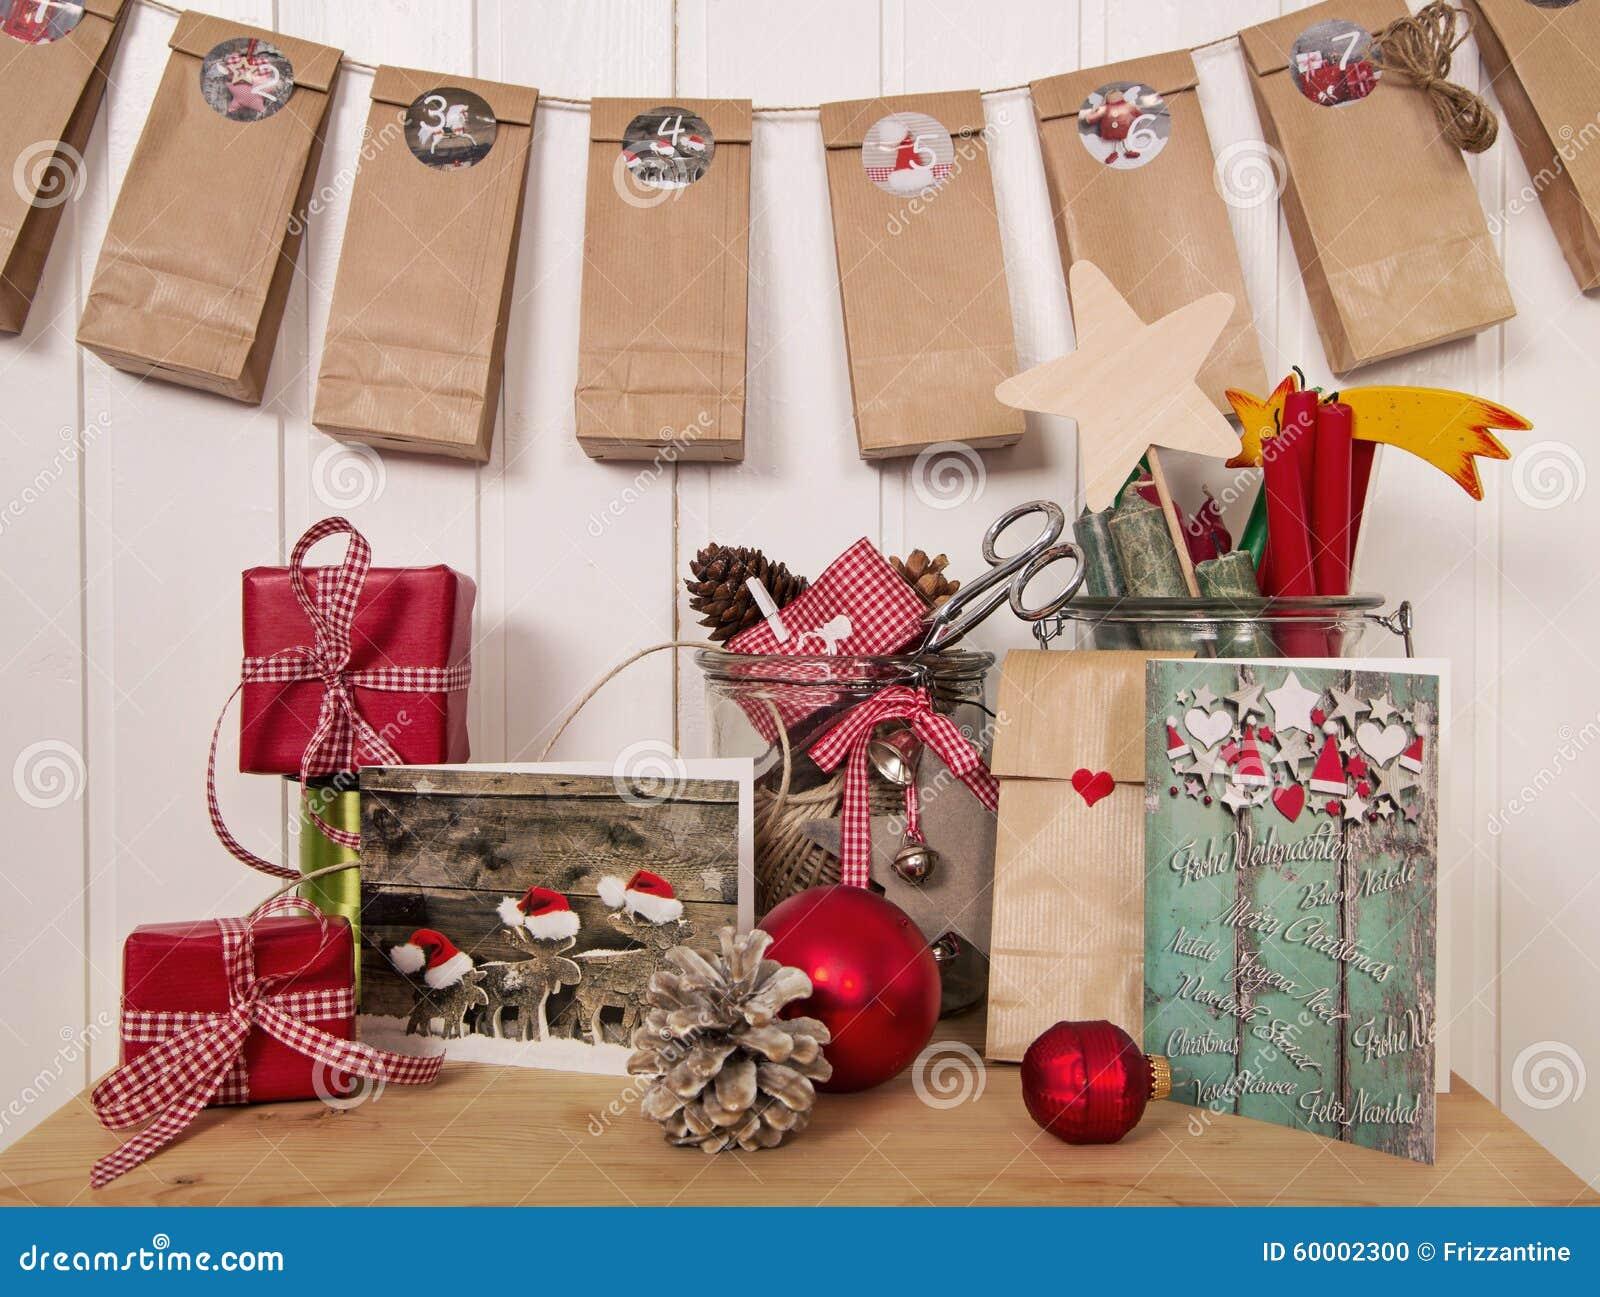 Handmade christmas presents and advent calendar in red - Regalos originales para casa ...